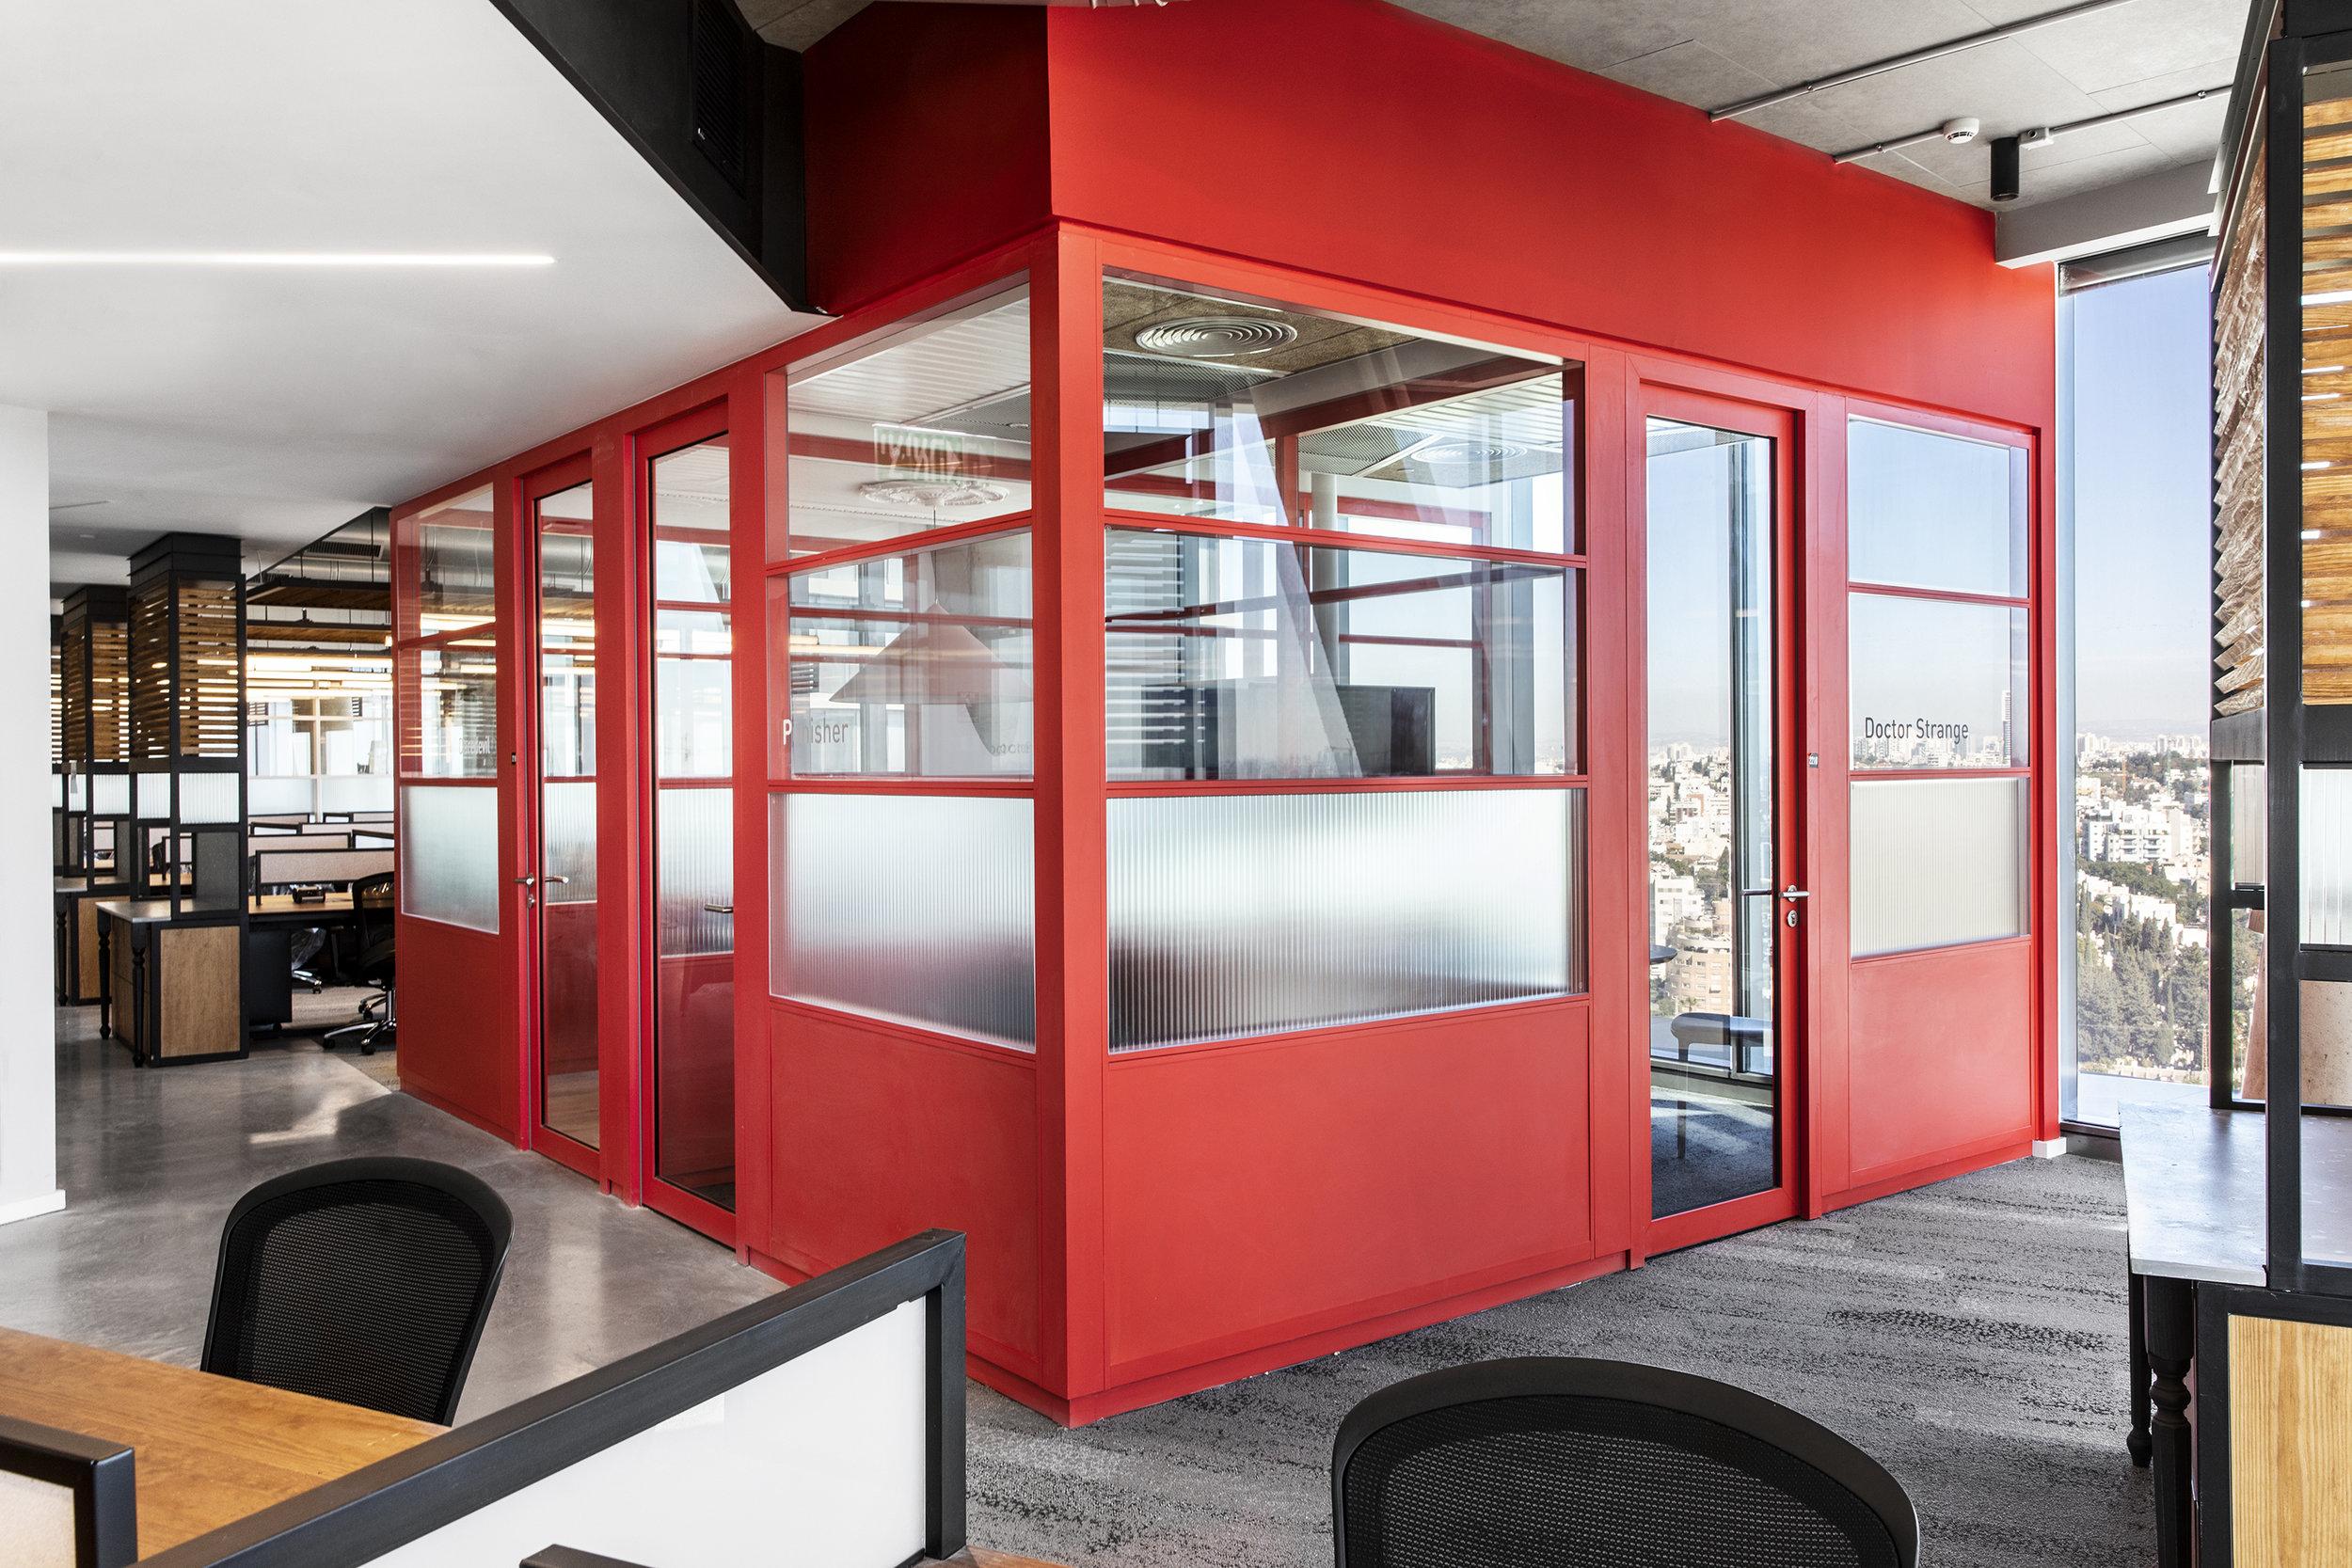 רואי דוד אדריכלות - אדריכל - נטורל אינטליג'נס - ROY DAVID - ARCHITECTURE - ARCHITECT - NI (91).jpg